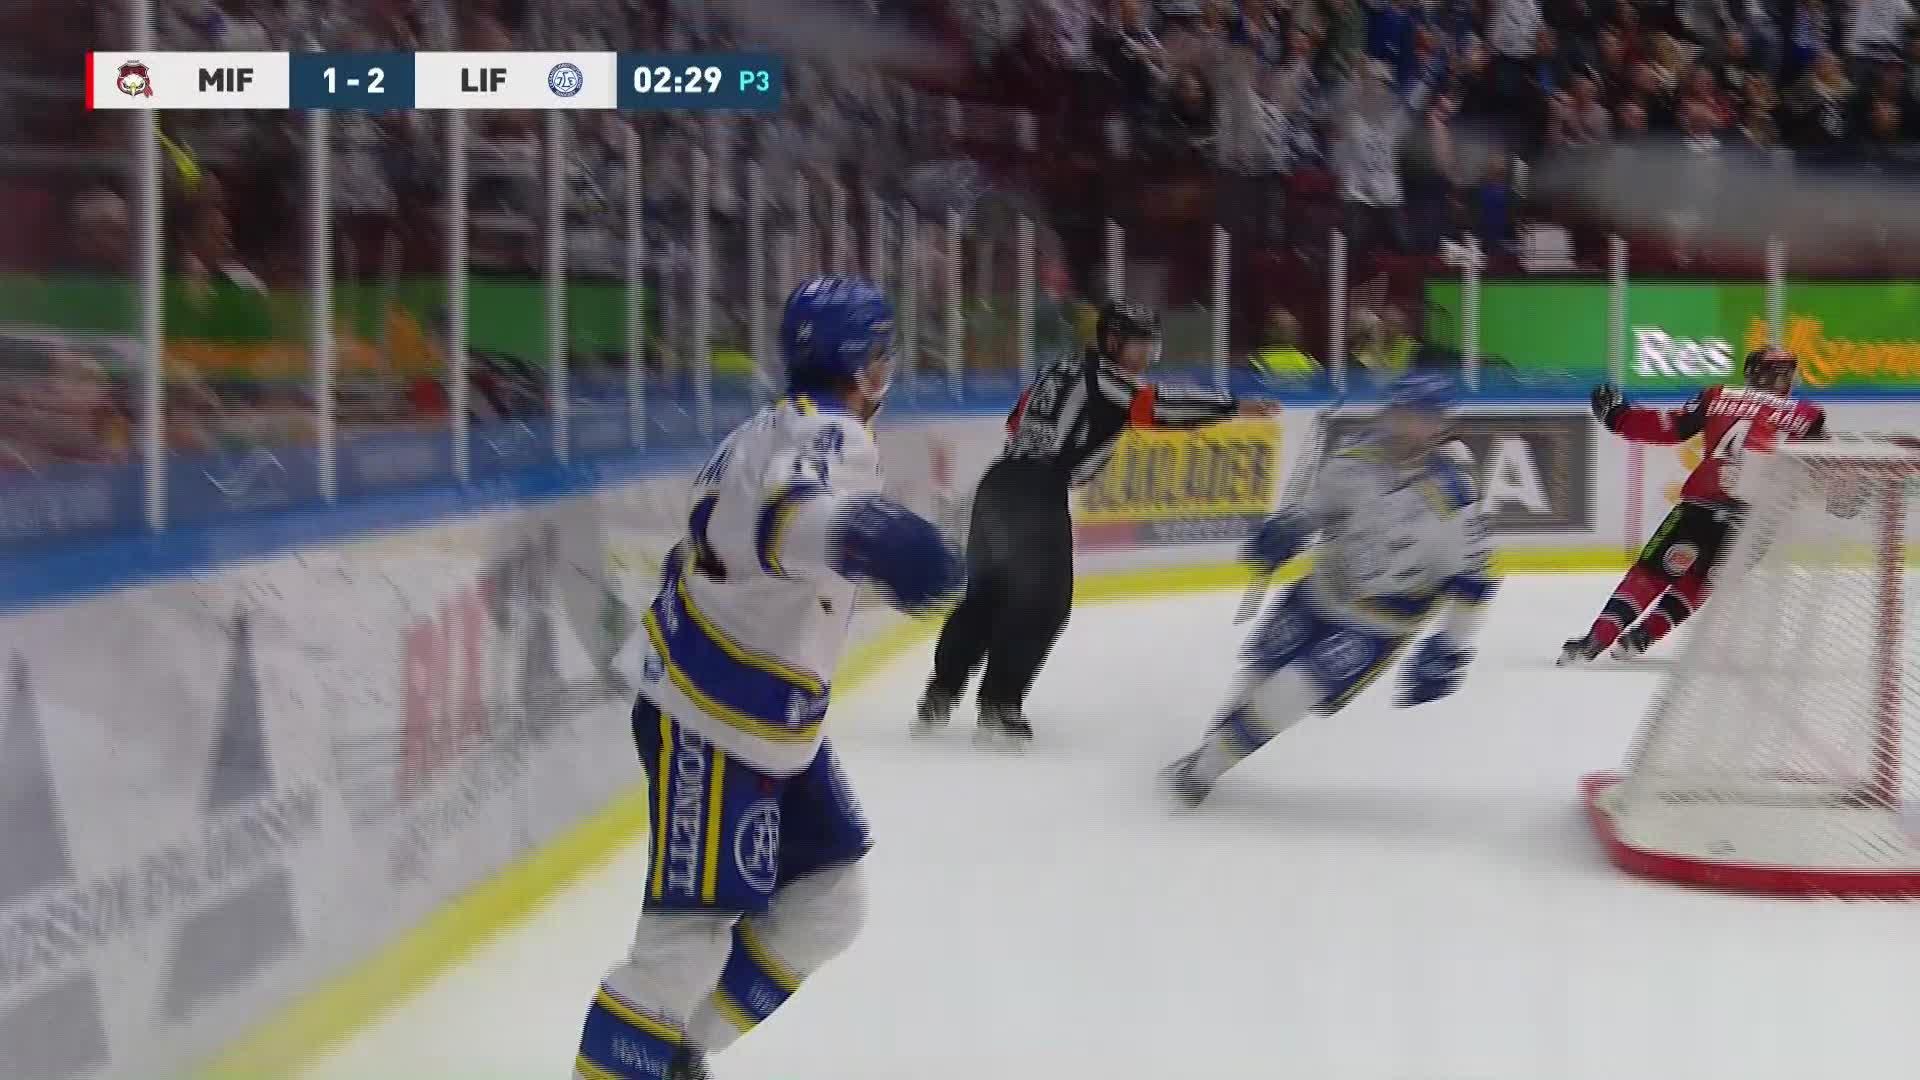 Malmö Redhawks - Leksands IF 1-3